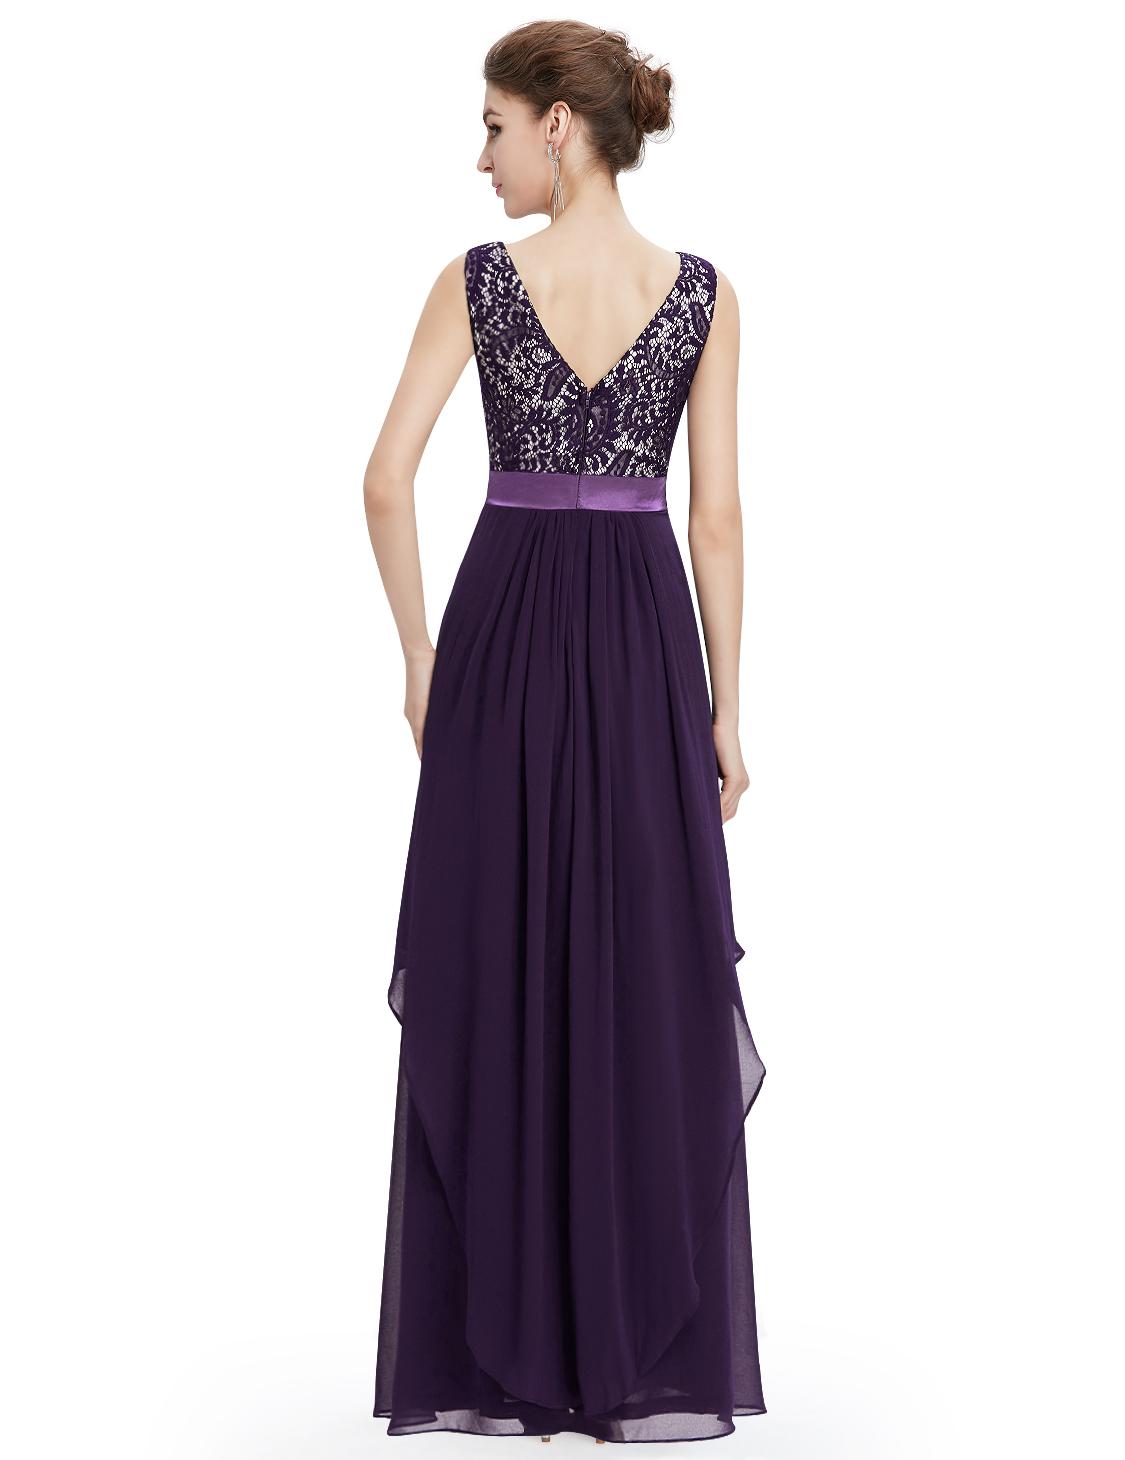 Cocktail Dresses Rental - Homecoming Prom Dresses